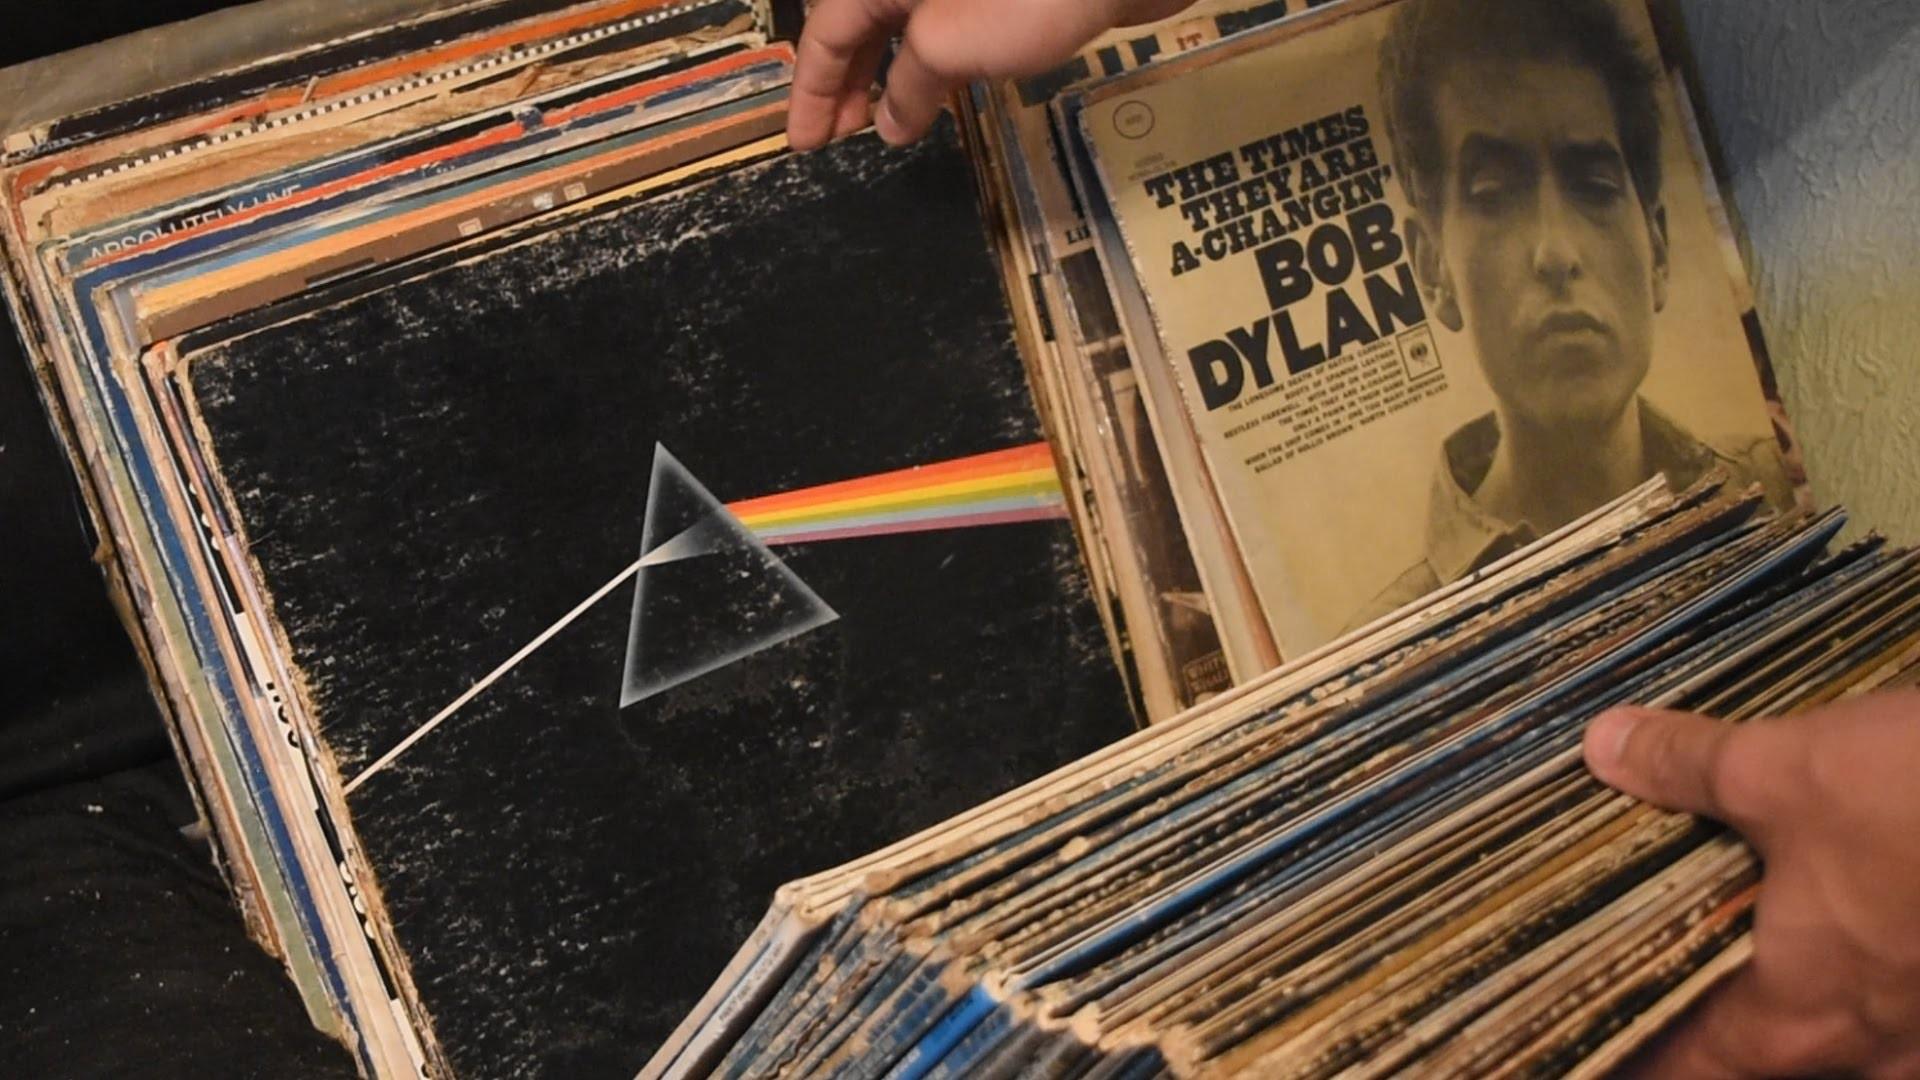 Listing LPs